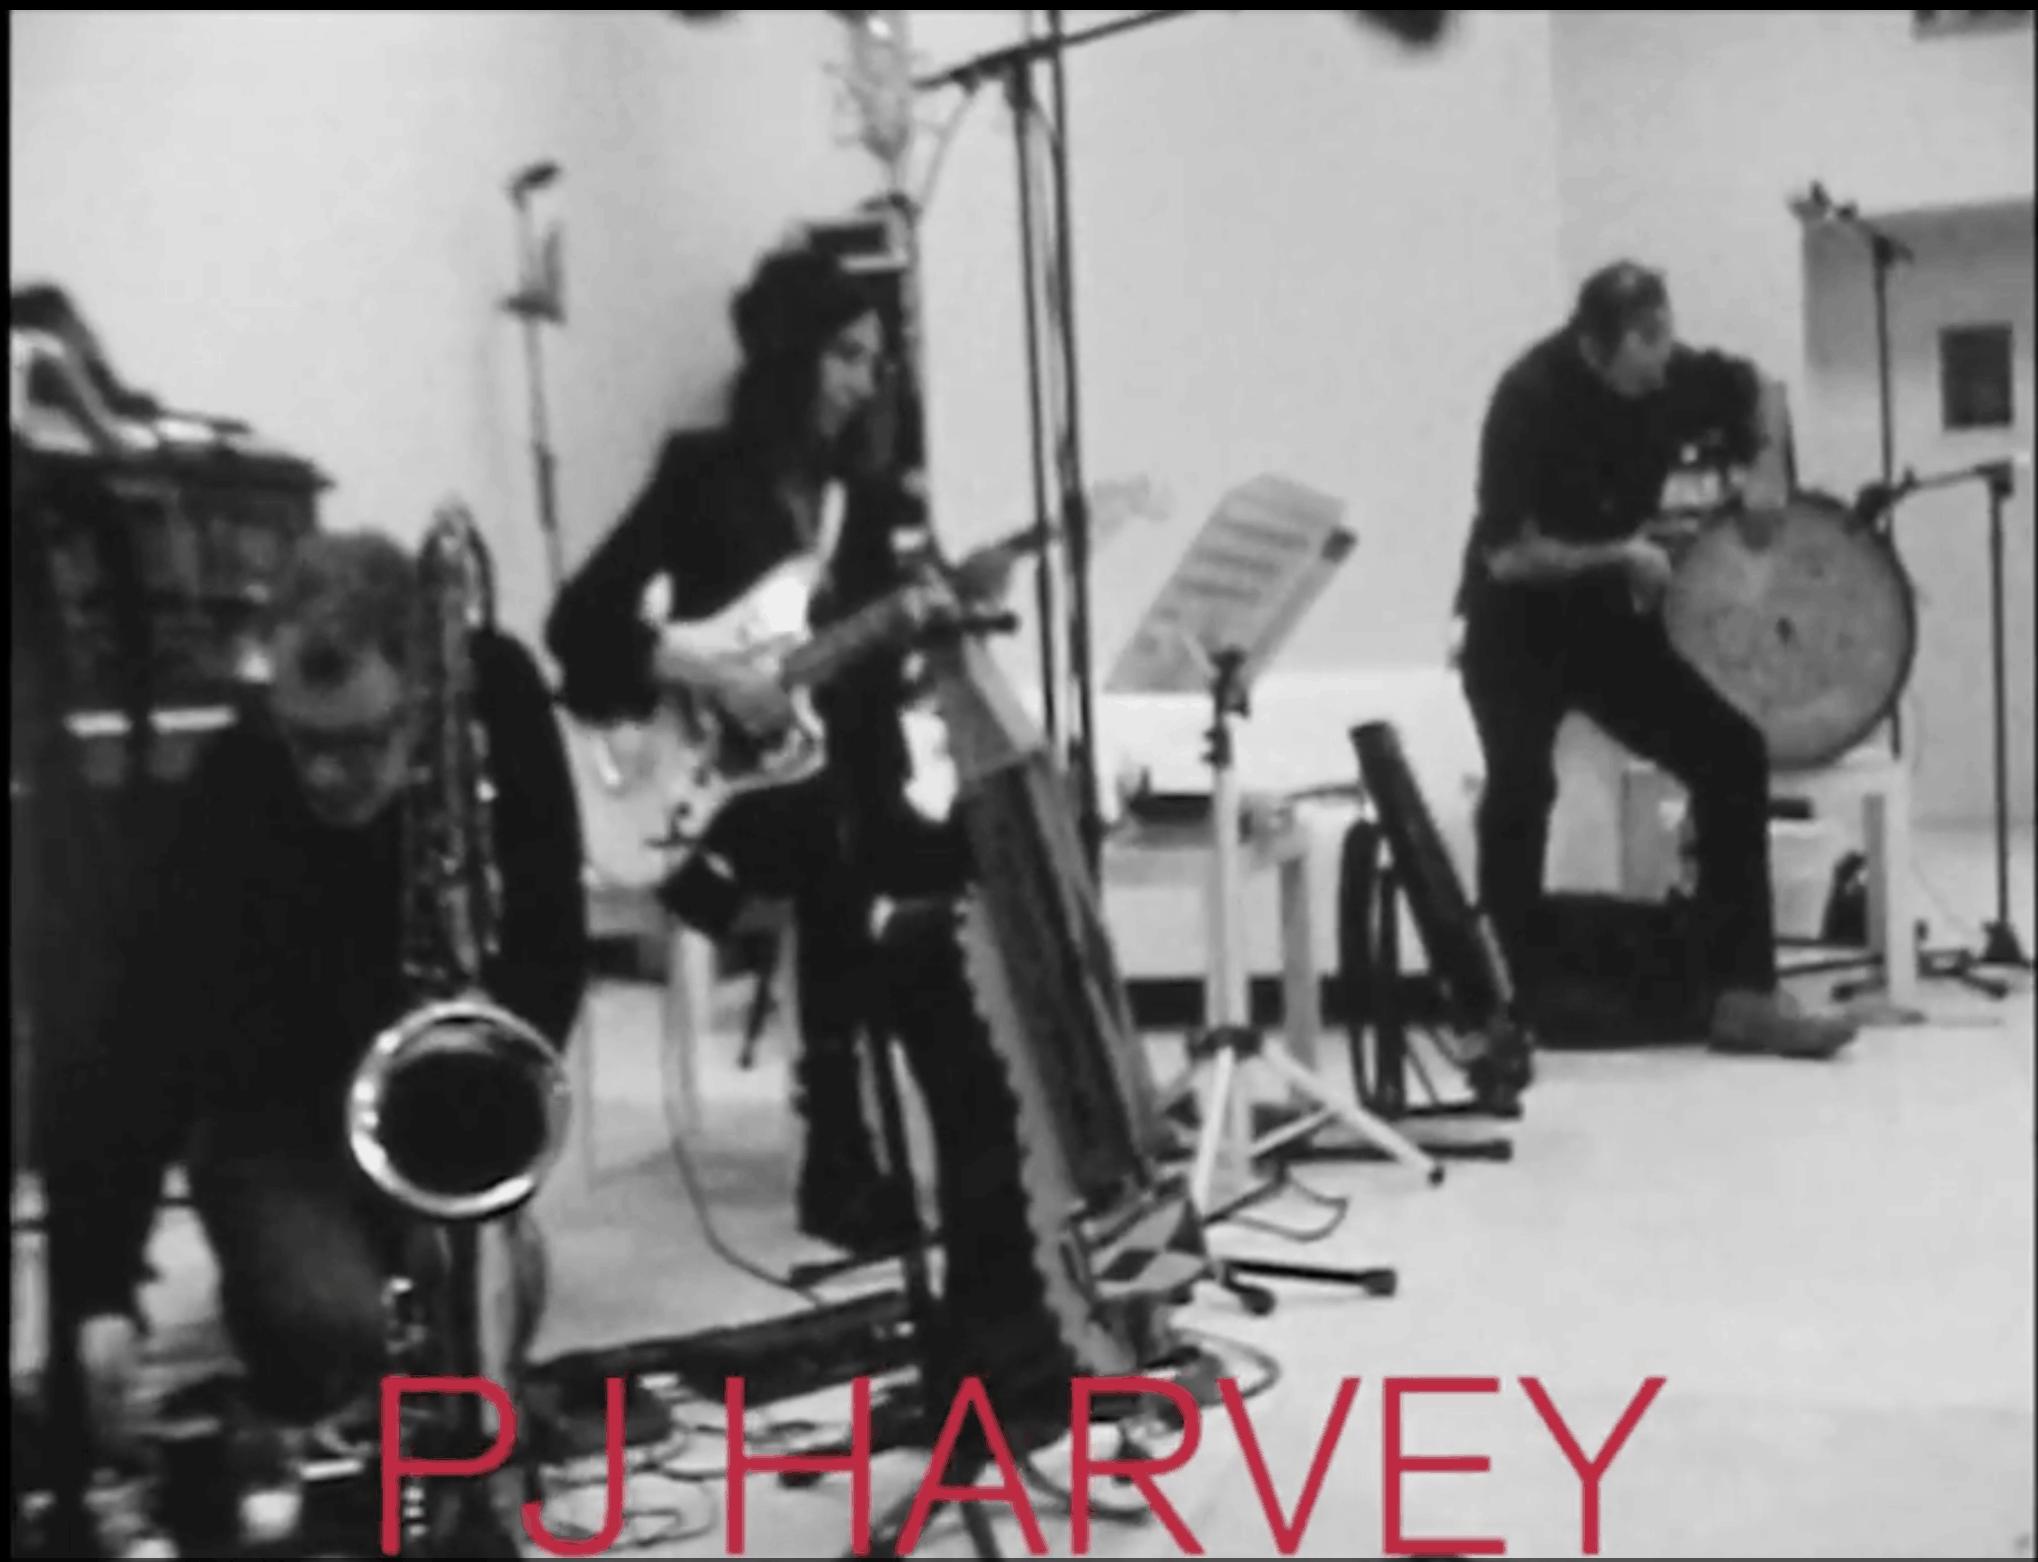 pj-harvey-new-song-bbc-2016